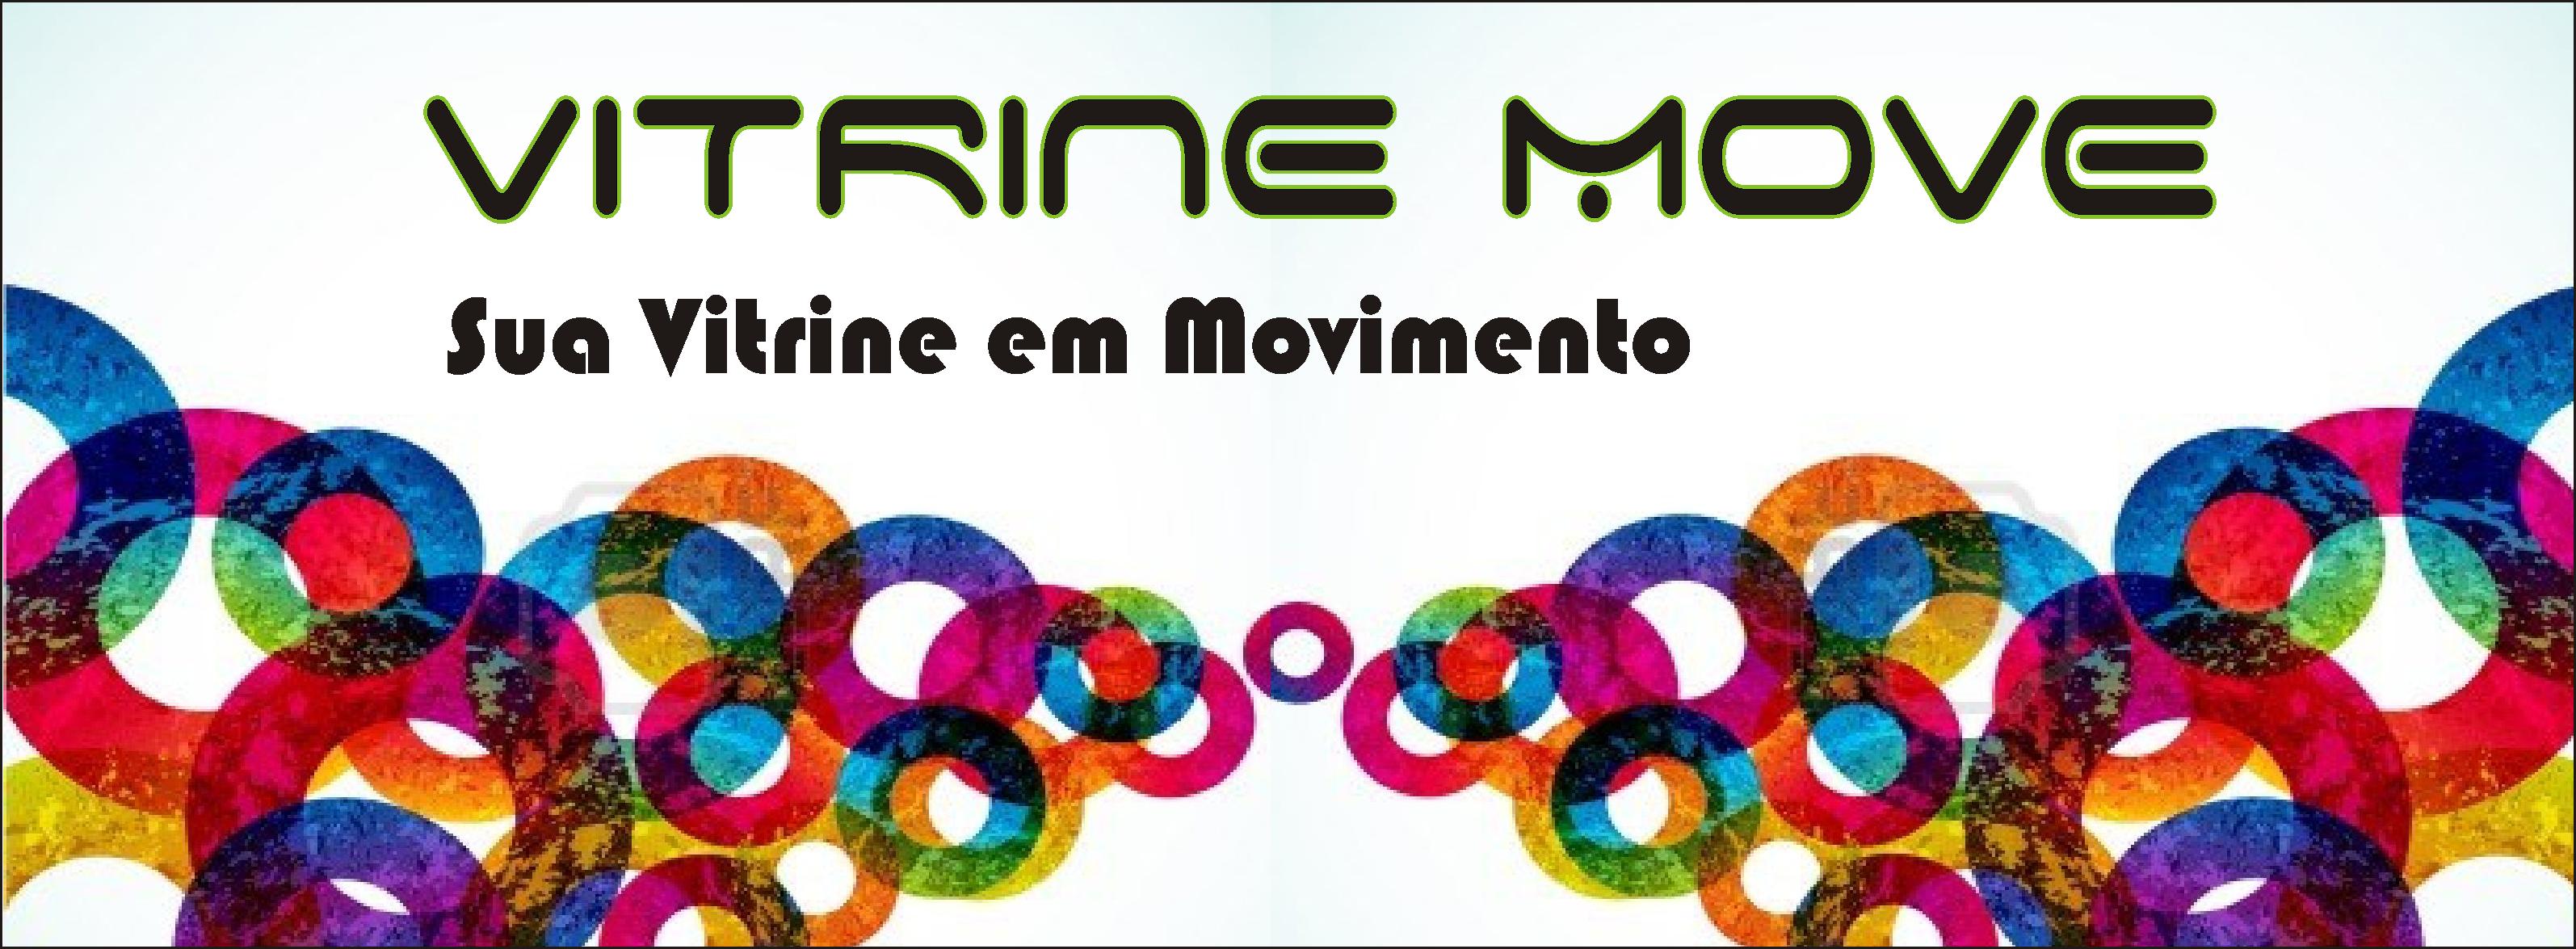 Vitrine Move